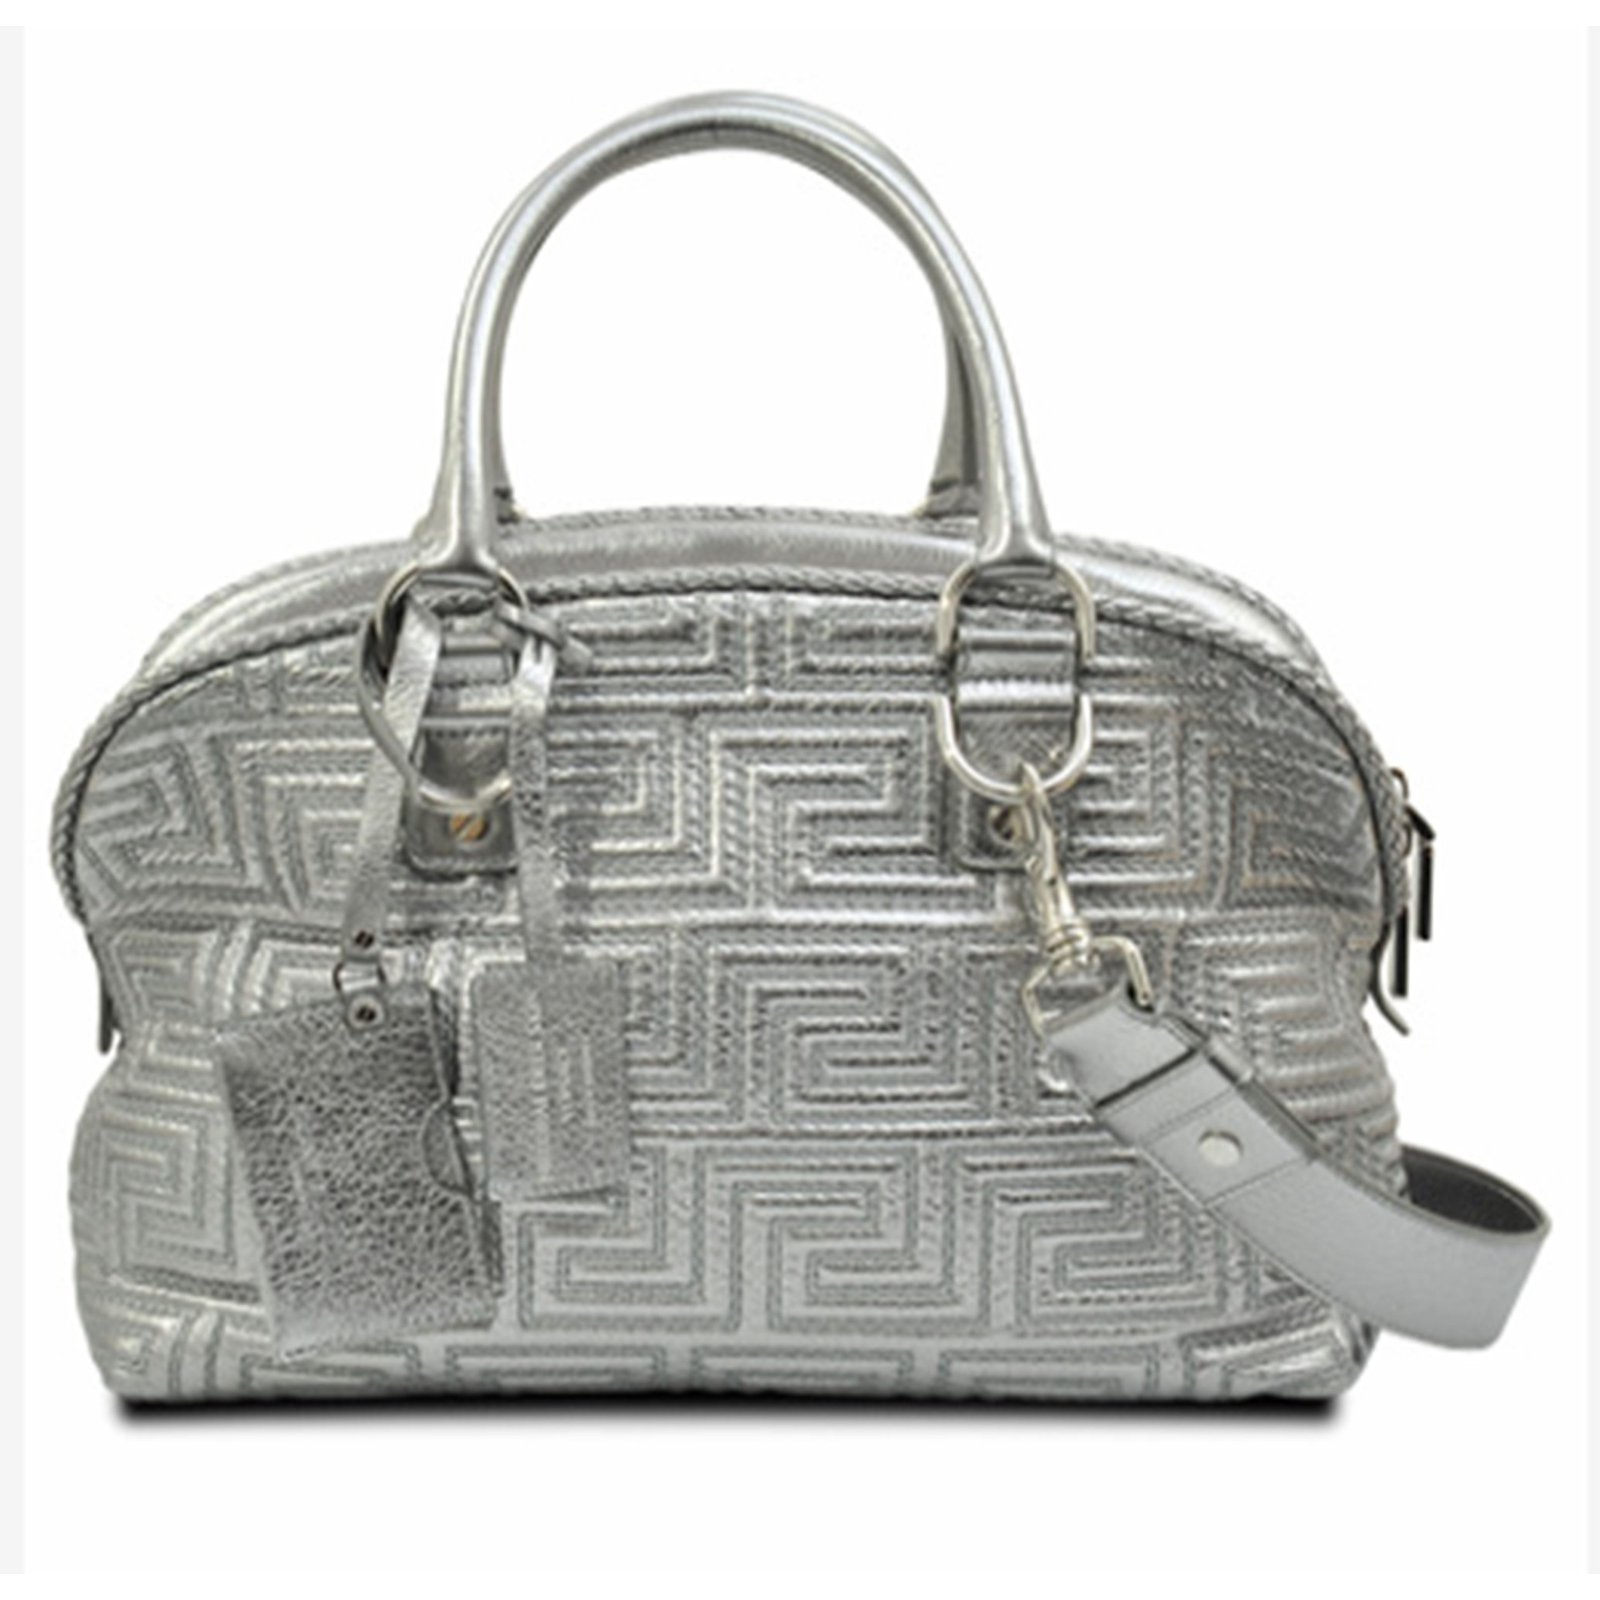 b39ed1a478 Gianni Versace Handbag Handbags Leather Grey